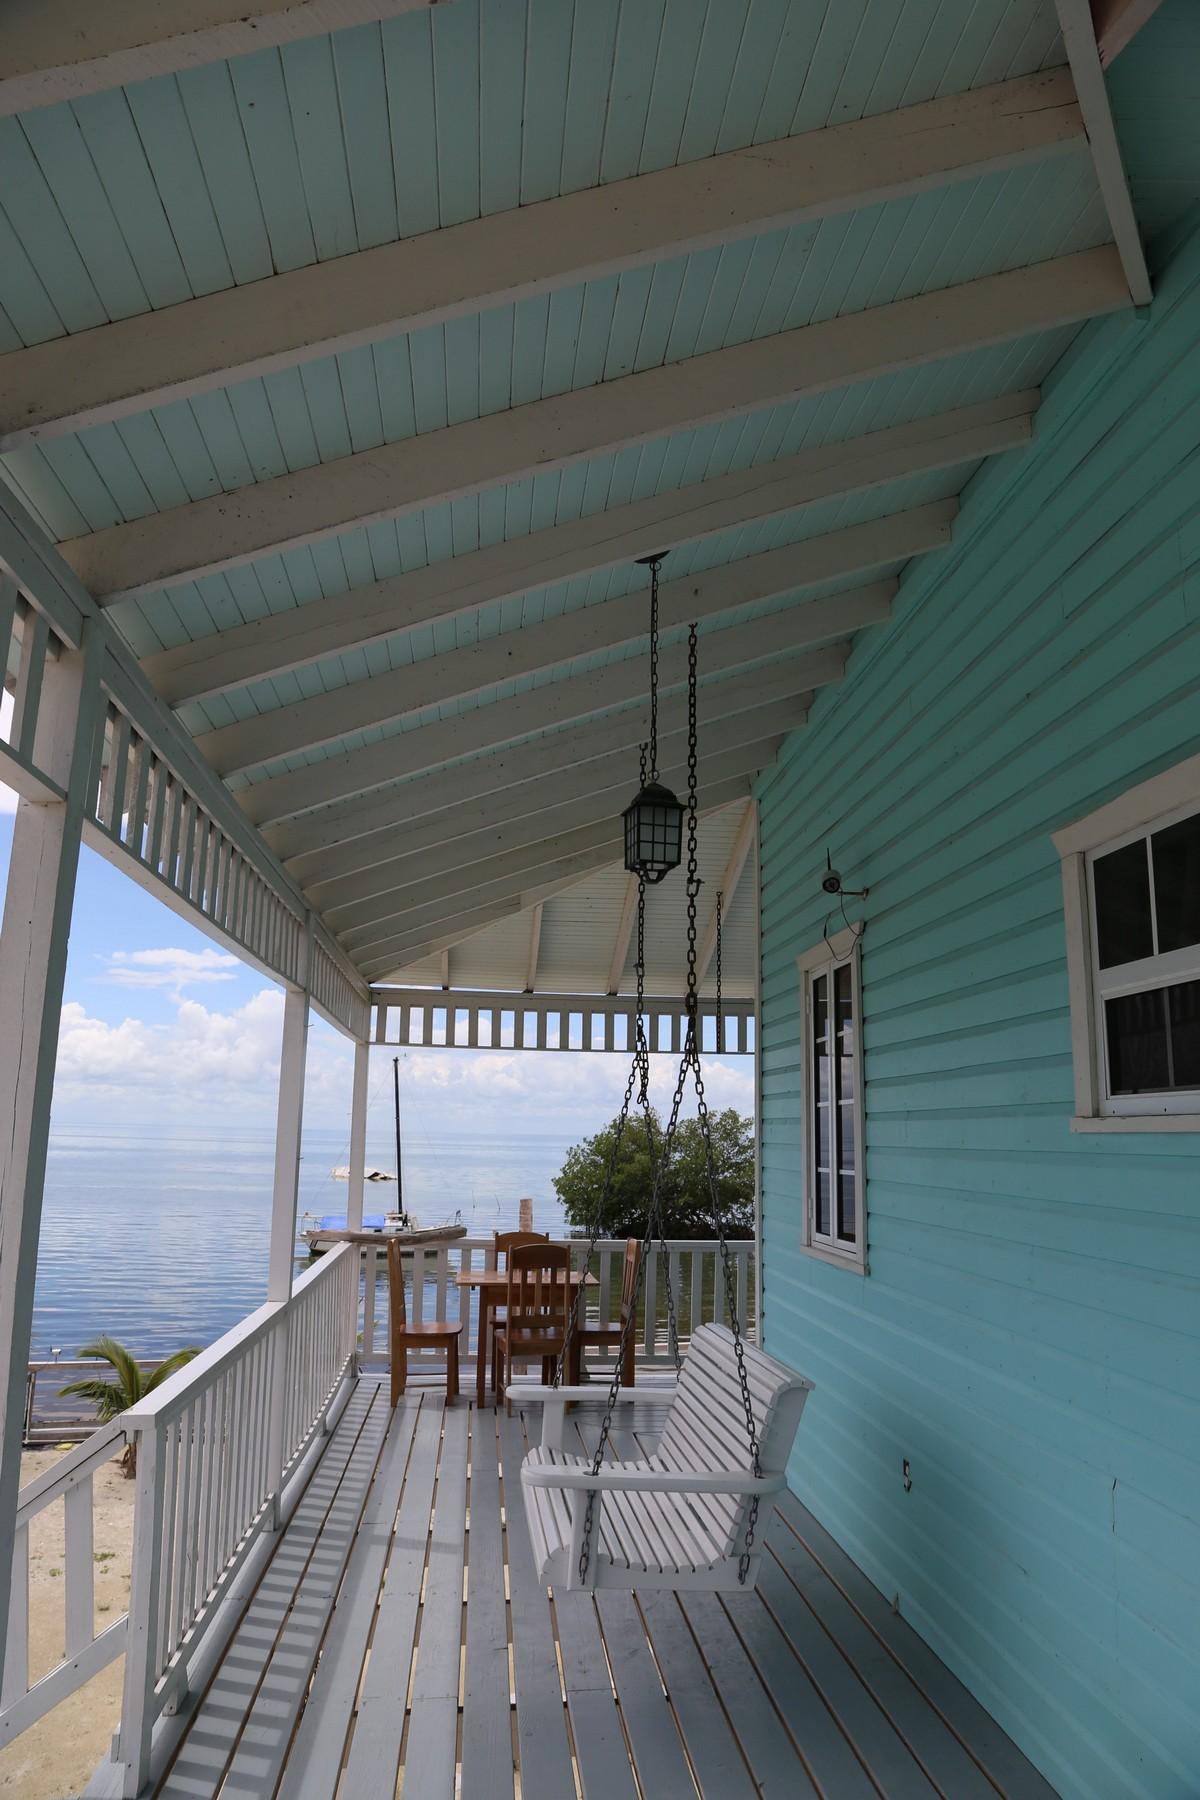 Multi-Family Home for Sale at Caye Caulker Oceanfront Caye Caulker, Belize